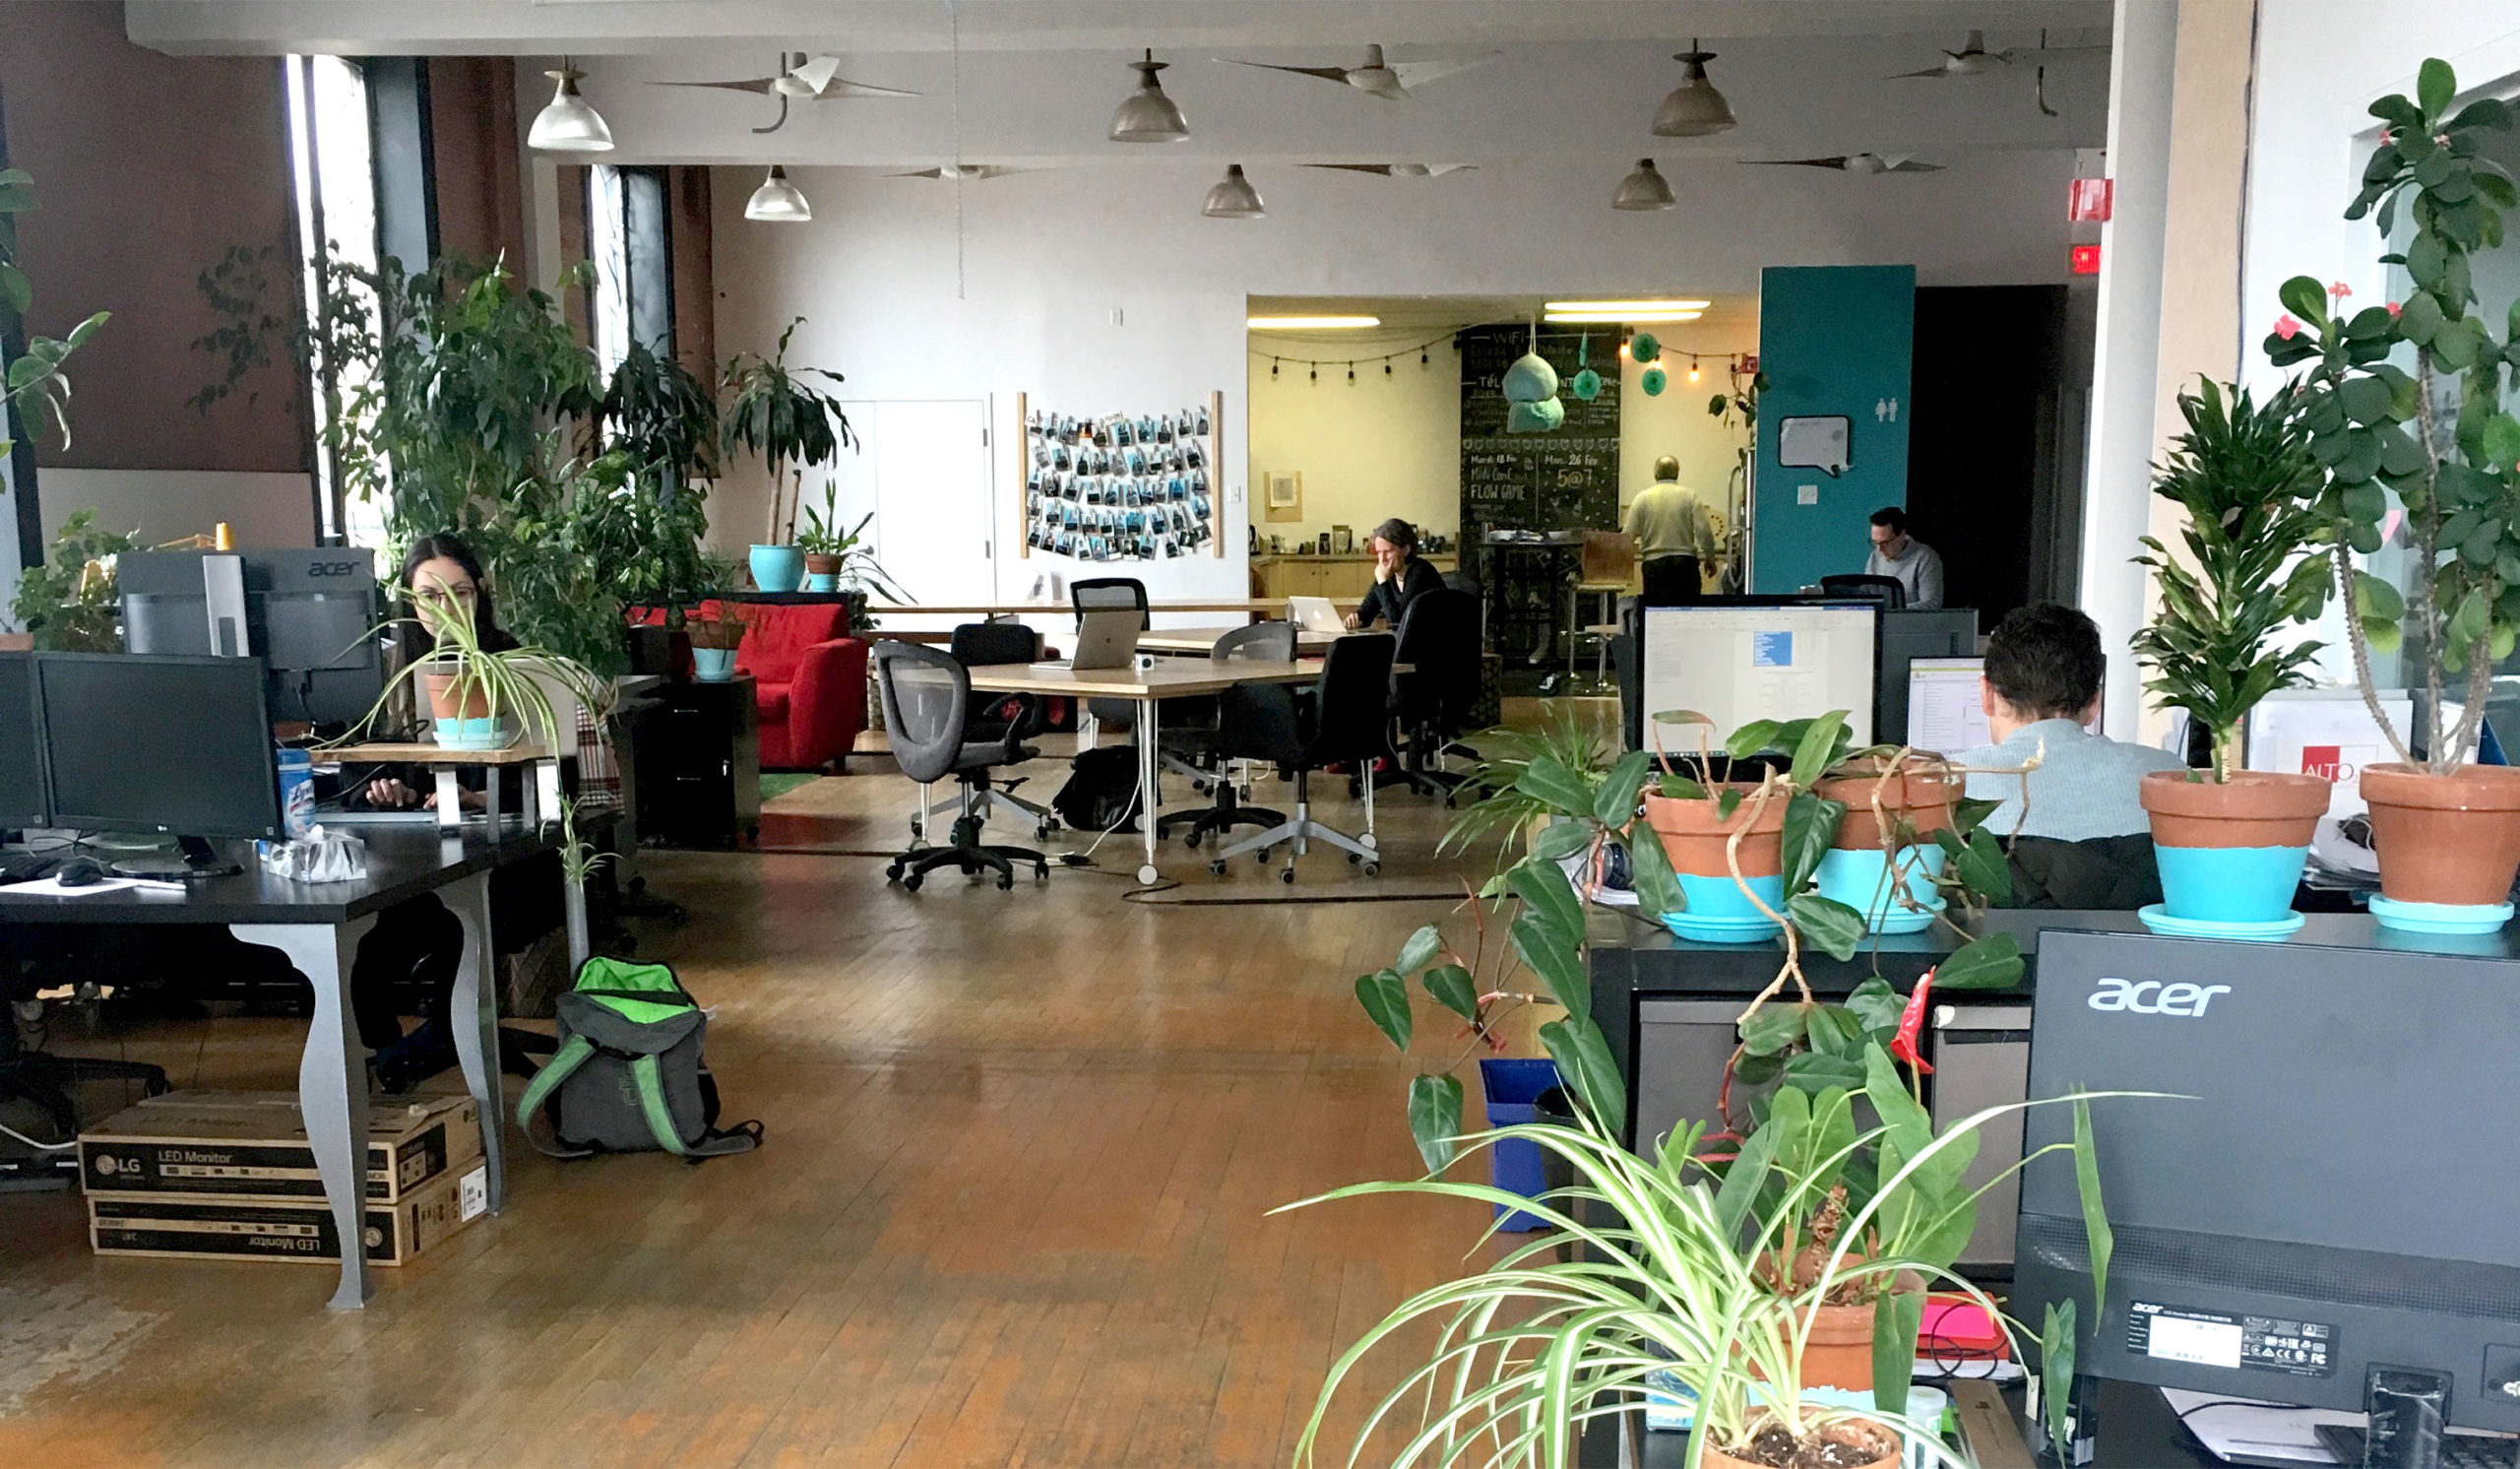 bureaux-flexibles-2-ecto-espace-de-coworking-collaboratif-montreal